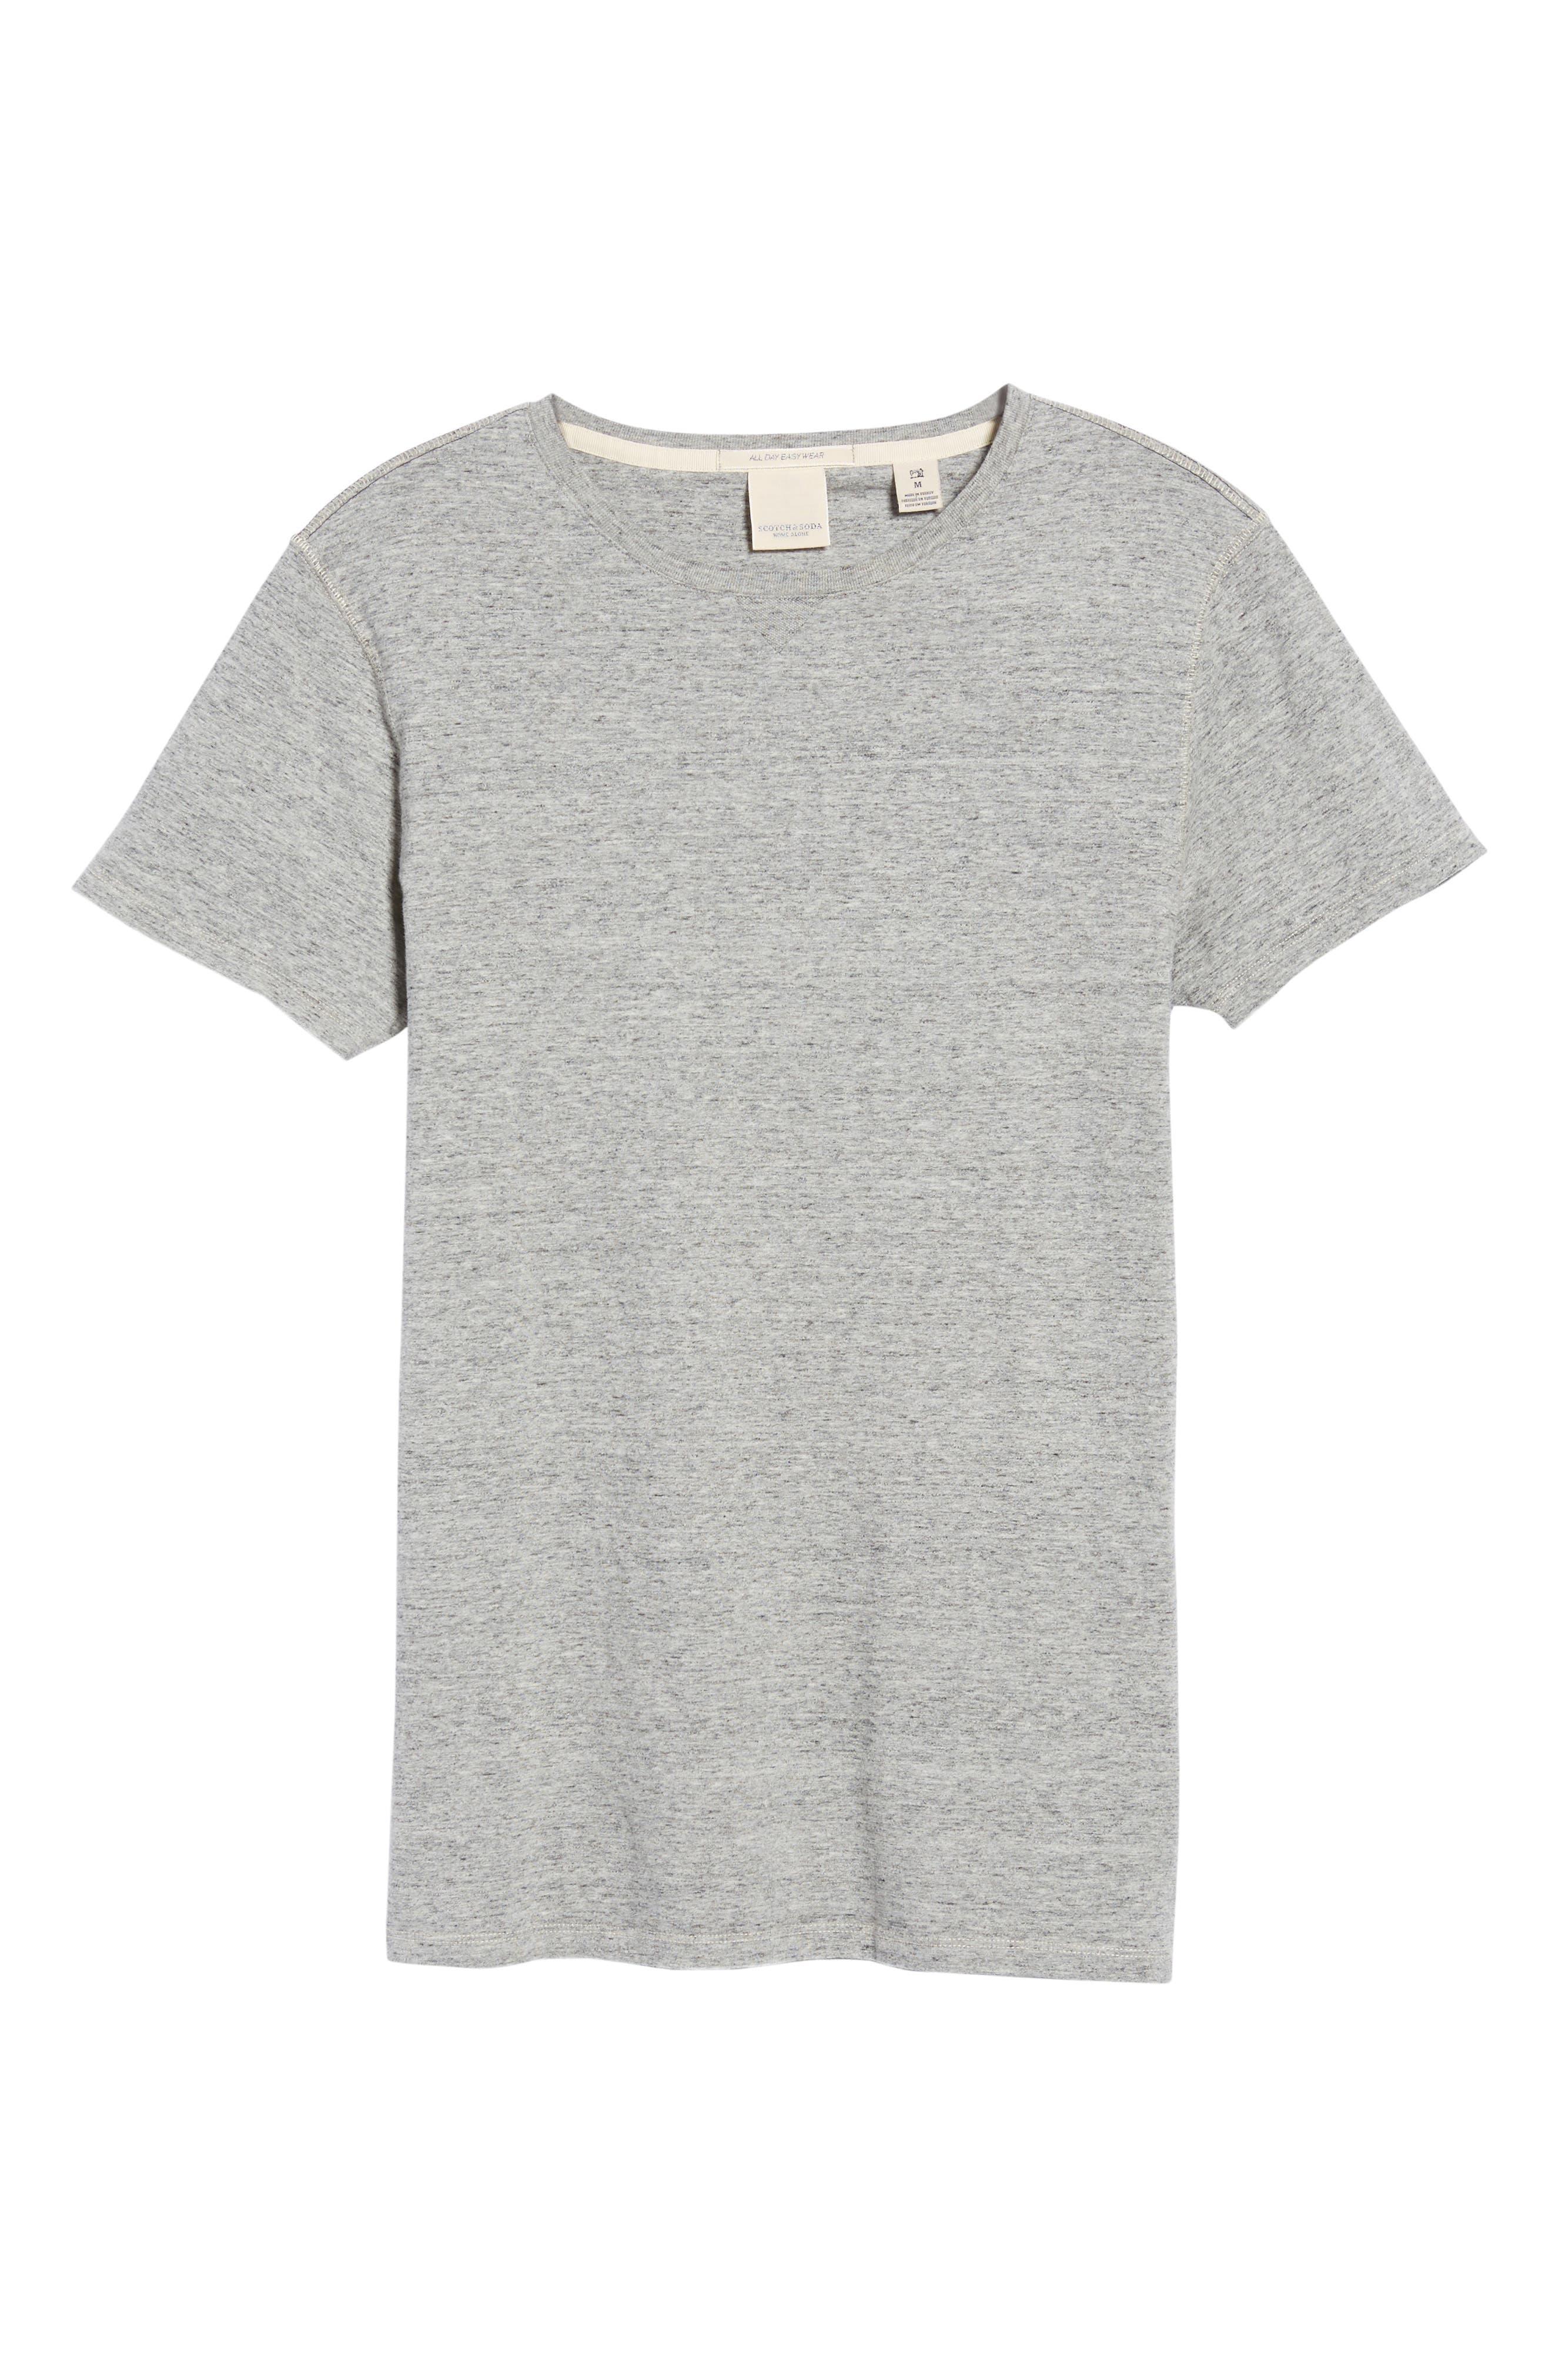 Home Alone Classic T-Shirt,                             Alternate thumbnail 6, color,                             020